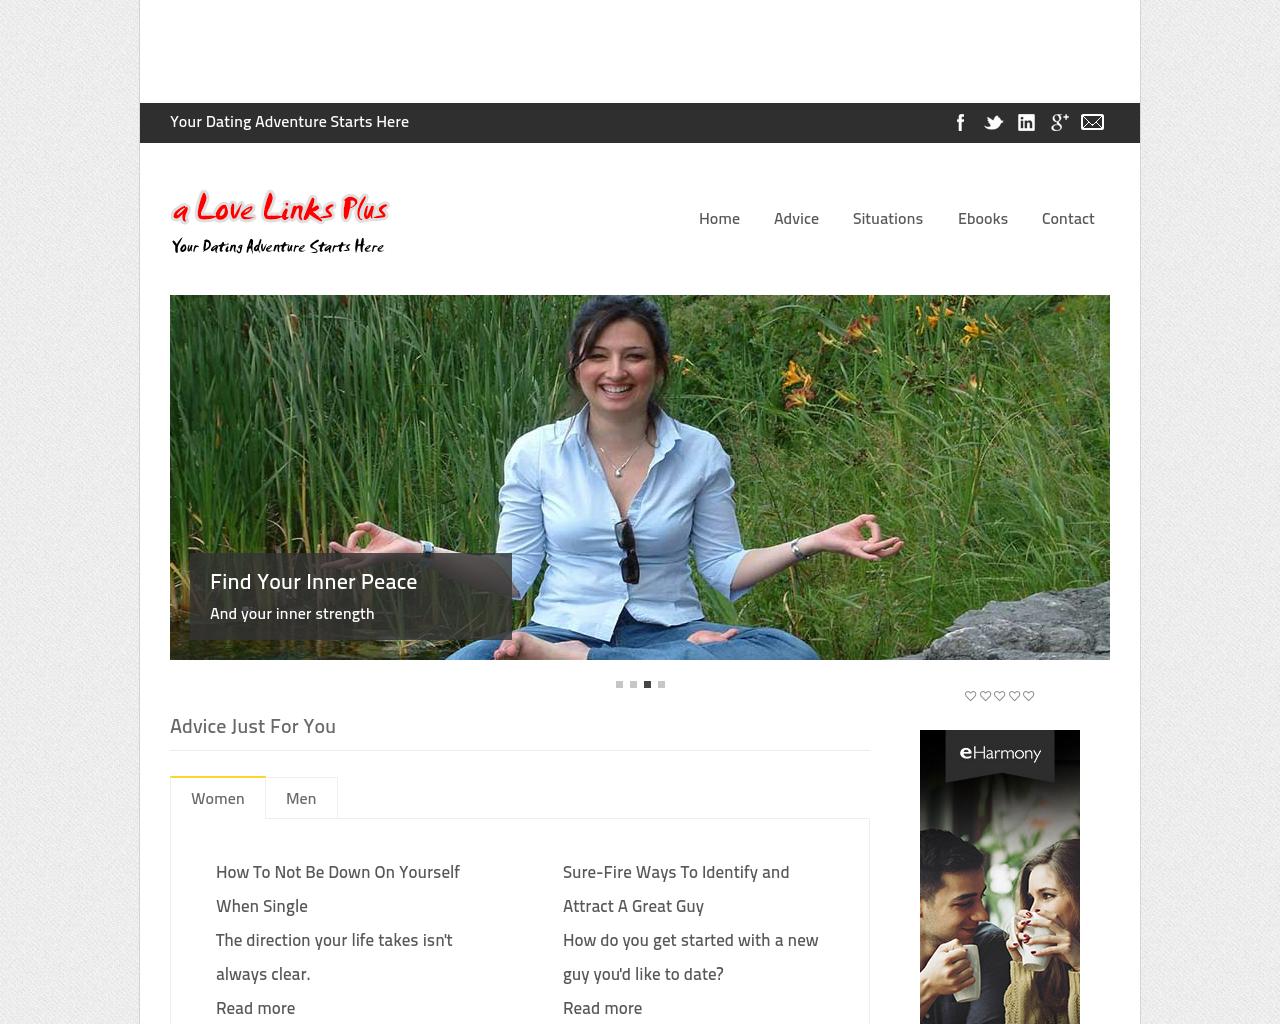 ALoveLinksPlus-Advertising-Reviews-Pricing